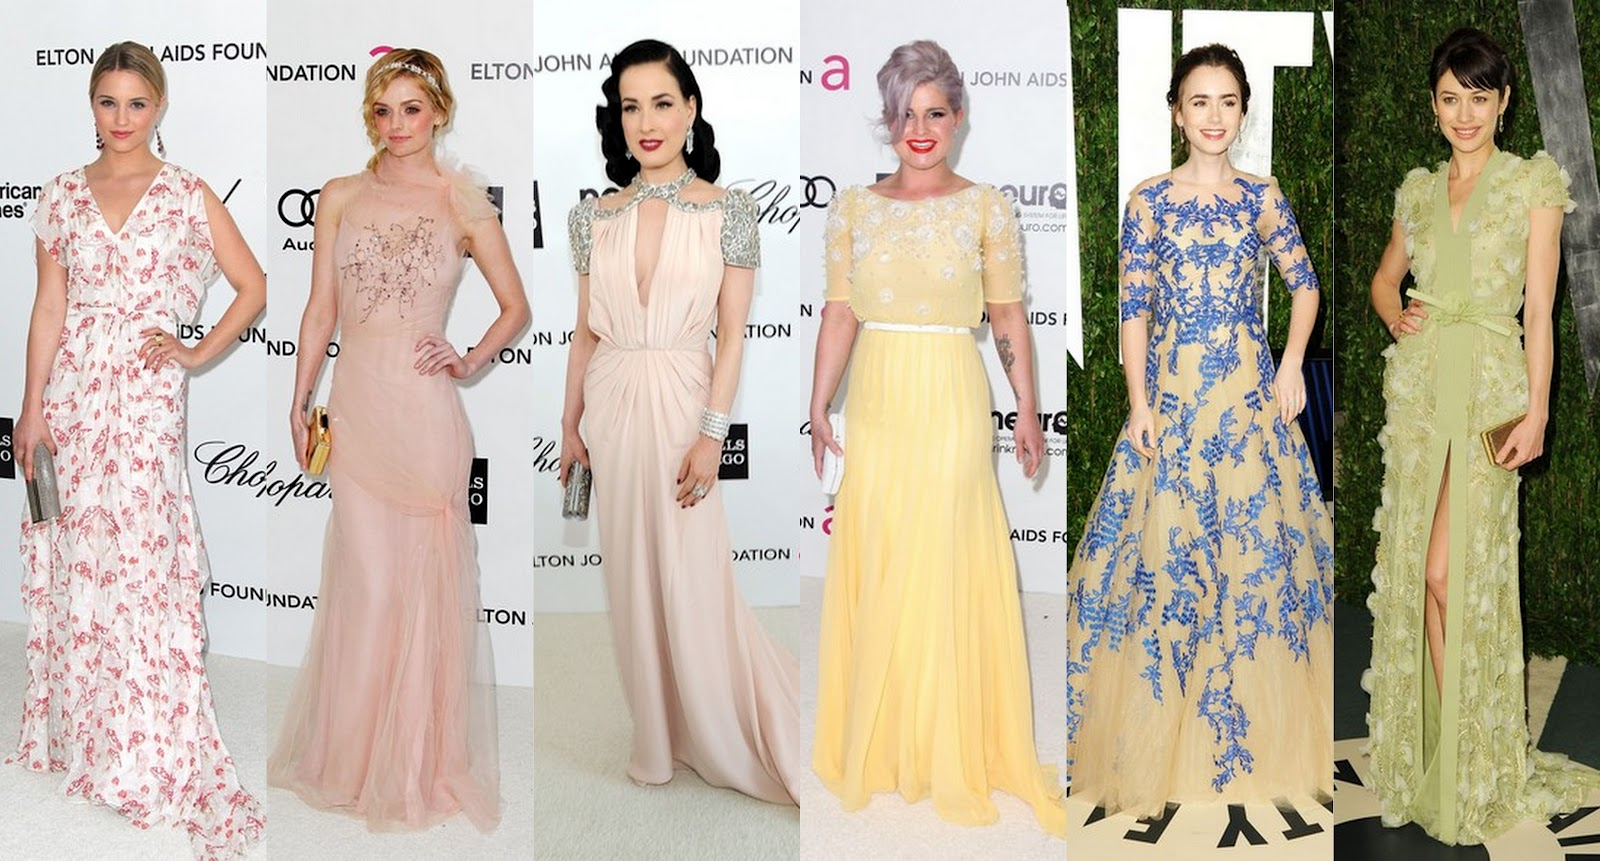 http://3.bp.blogspot.com/-sUC1sL16Wu4/T6zoSFv35II/AAAAAAAAQQQ/BS-M4BSjd7Y/s1600/Oscar+Party+Dresses+20129.jpg